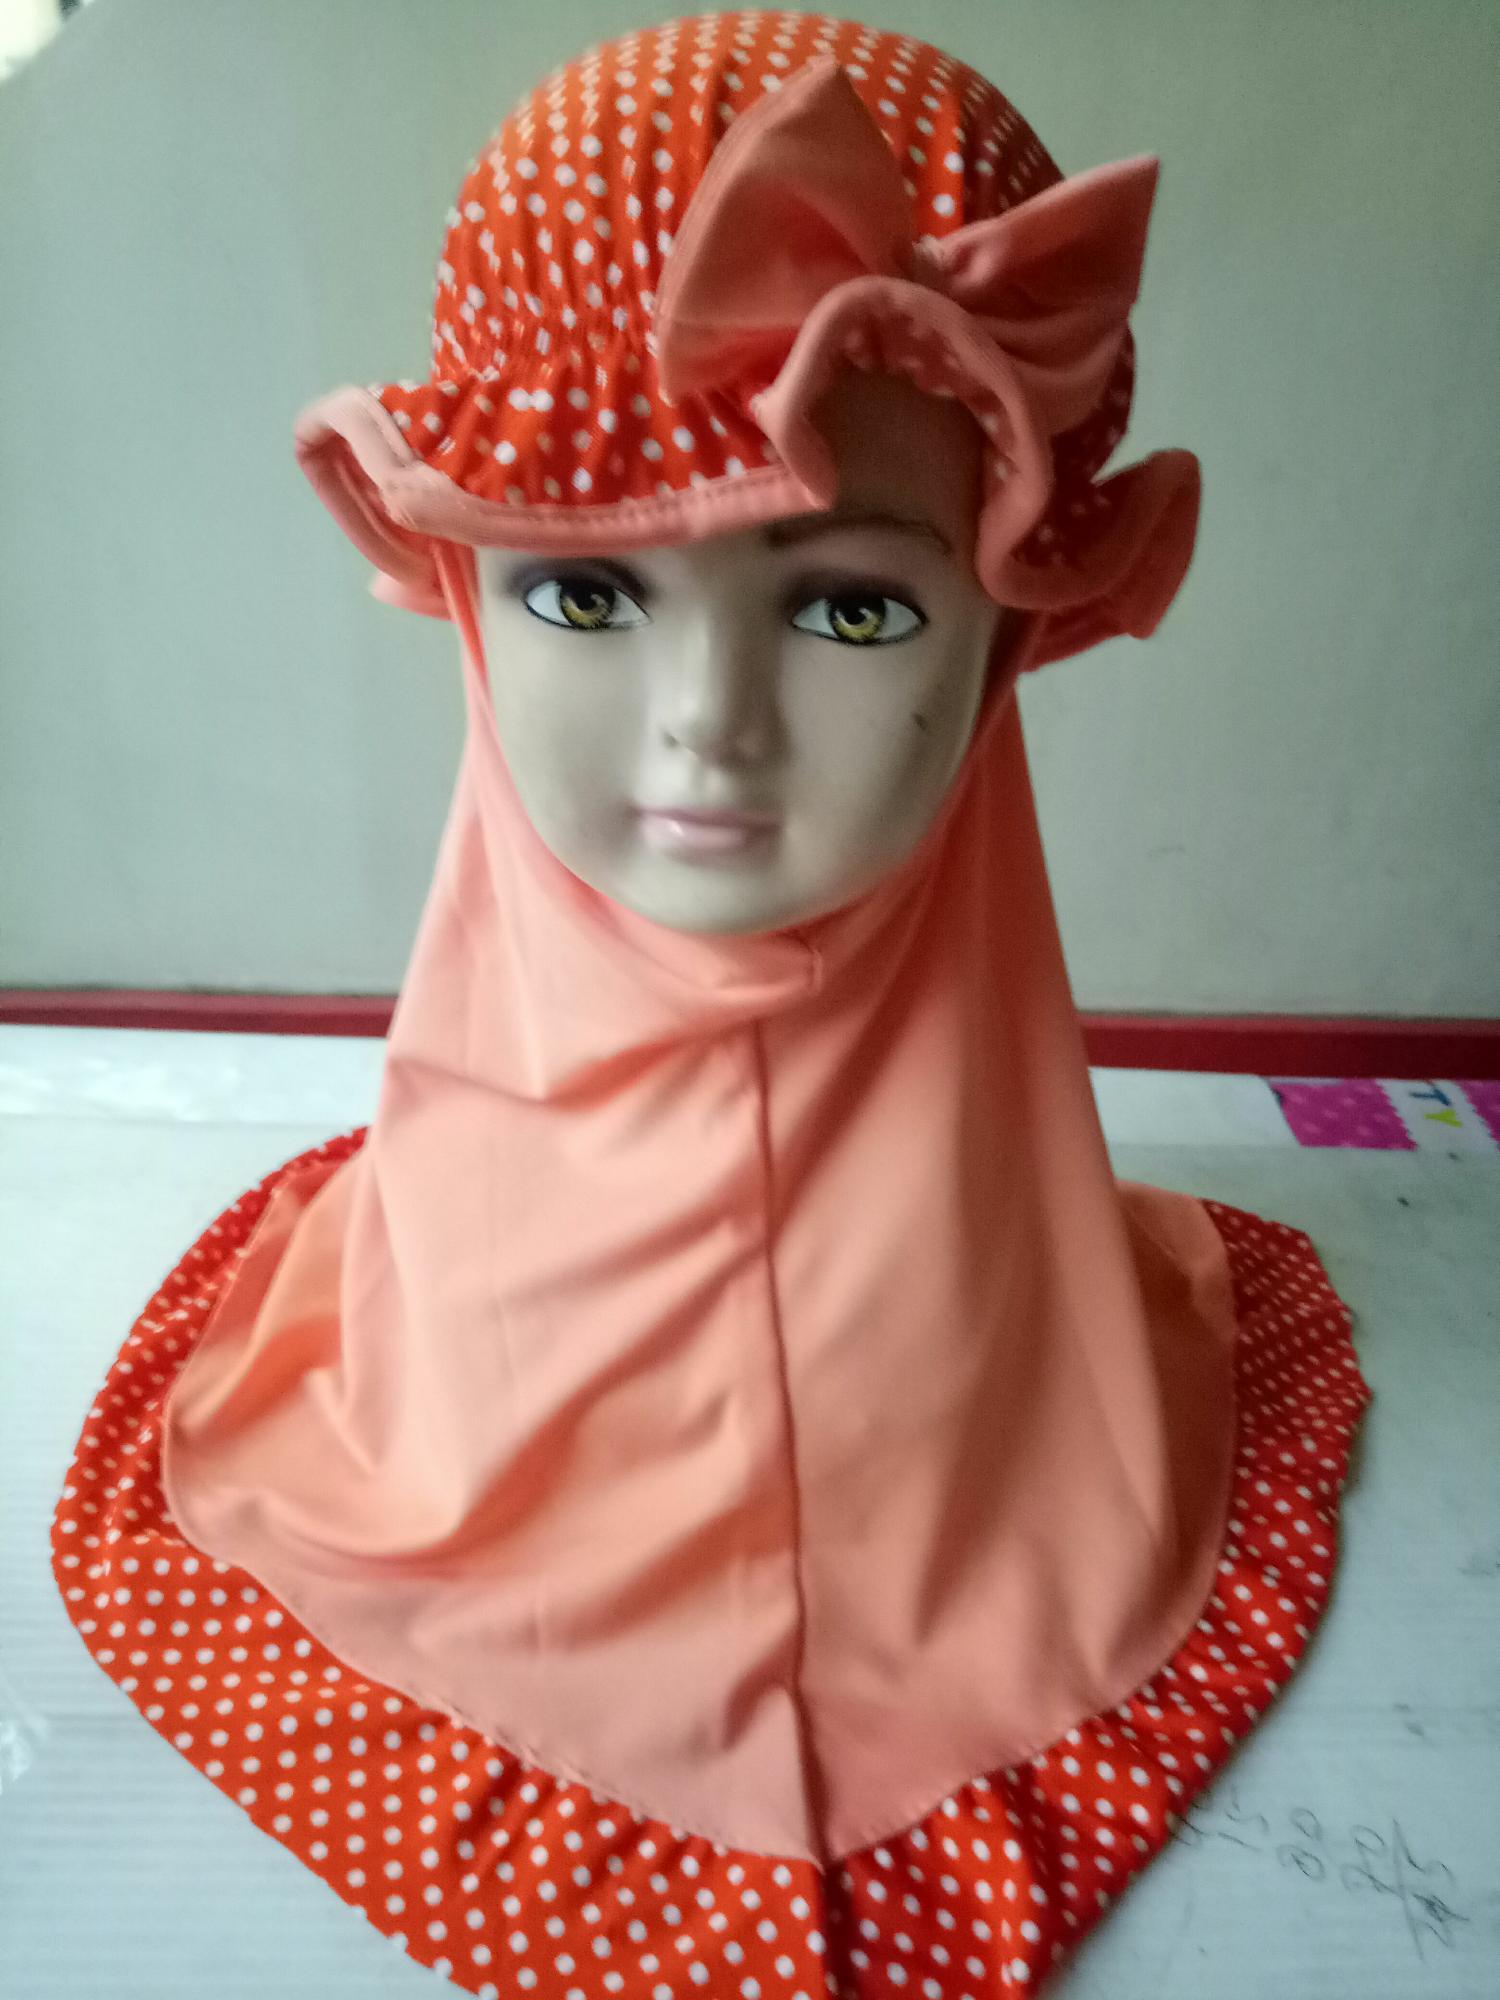 Jilbab Anak/Baby Turban Bisa Di Lepas Cantikkk